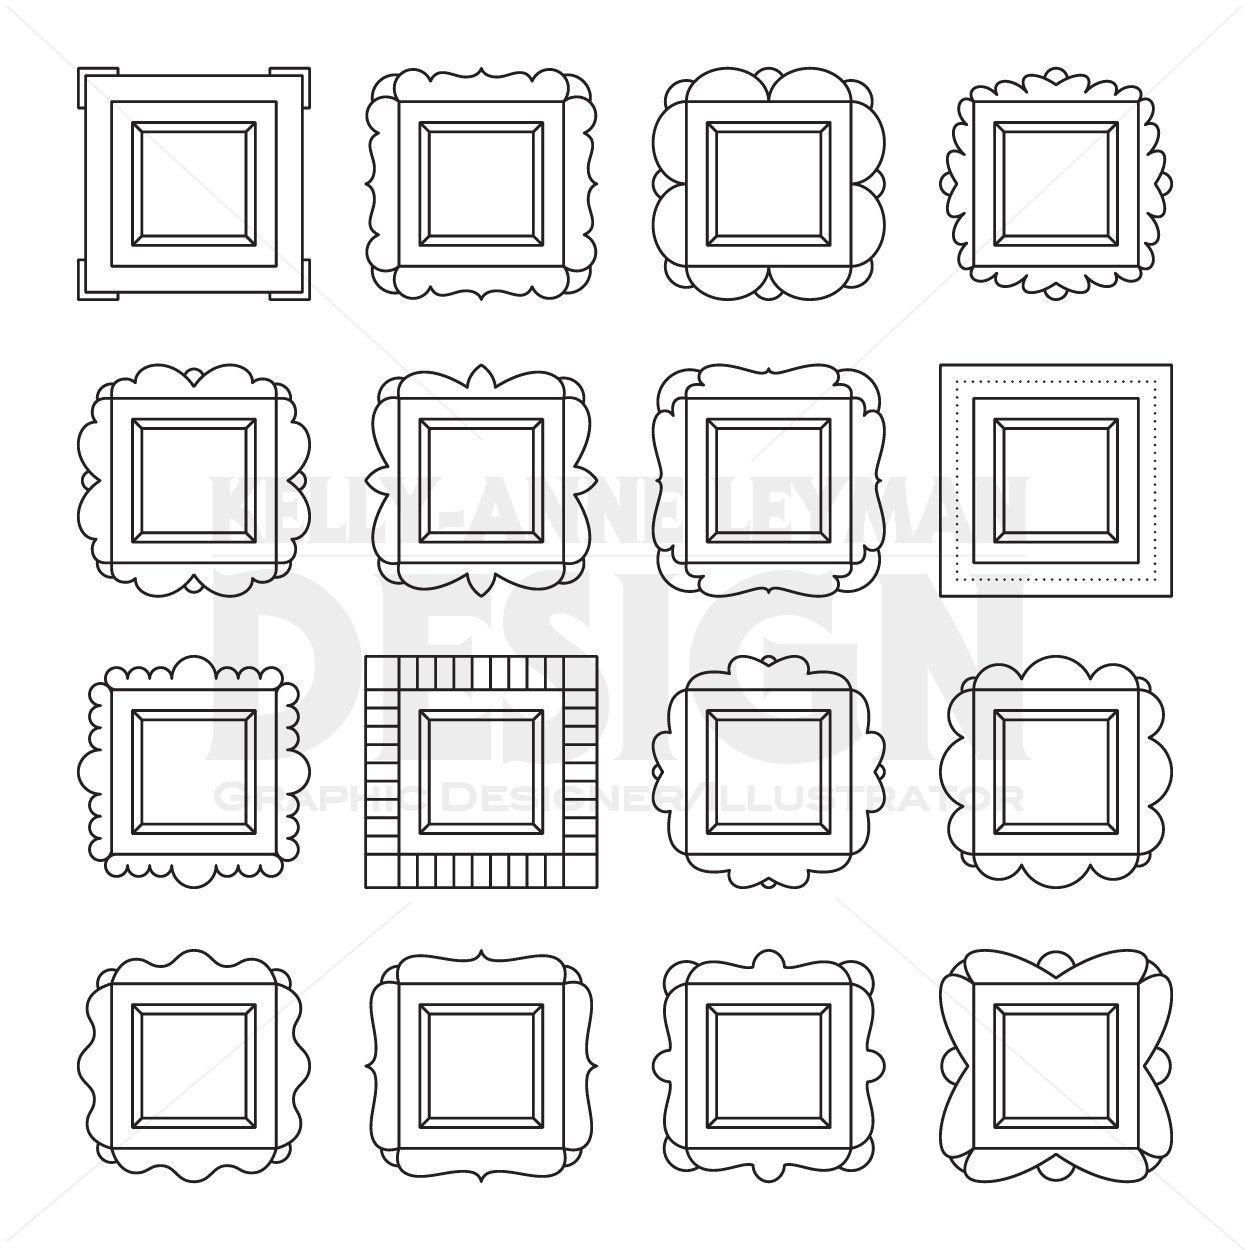 Pin By Decoptimiste On Wandgestaltung Annacb In 2021 Digital Frame Digital Labels Clip Art